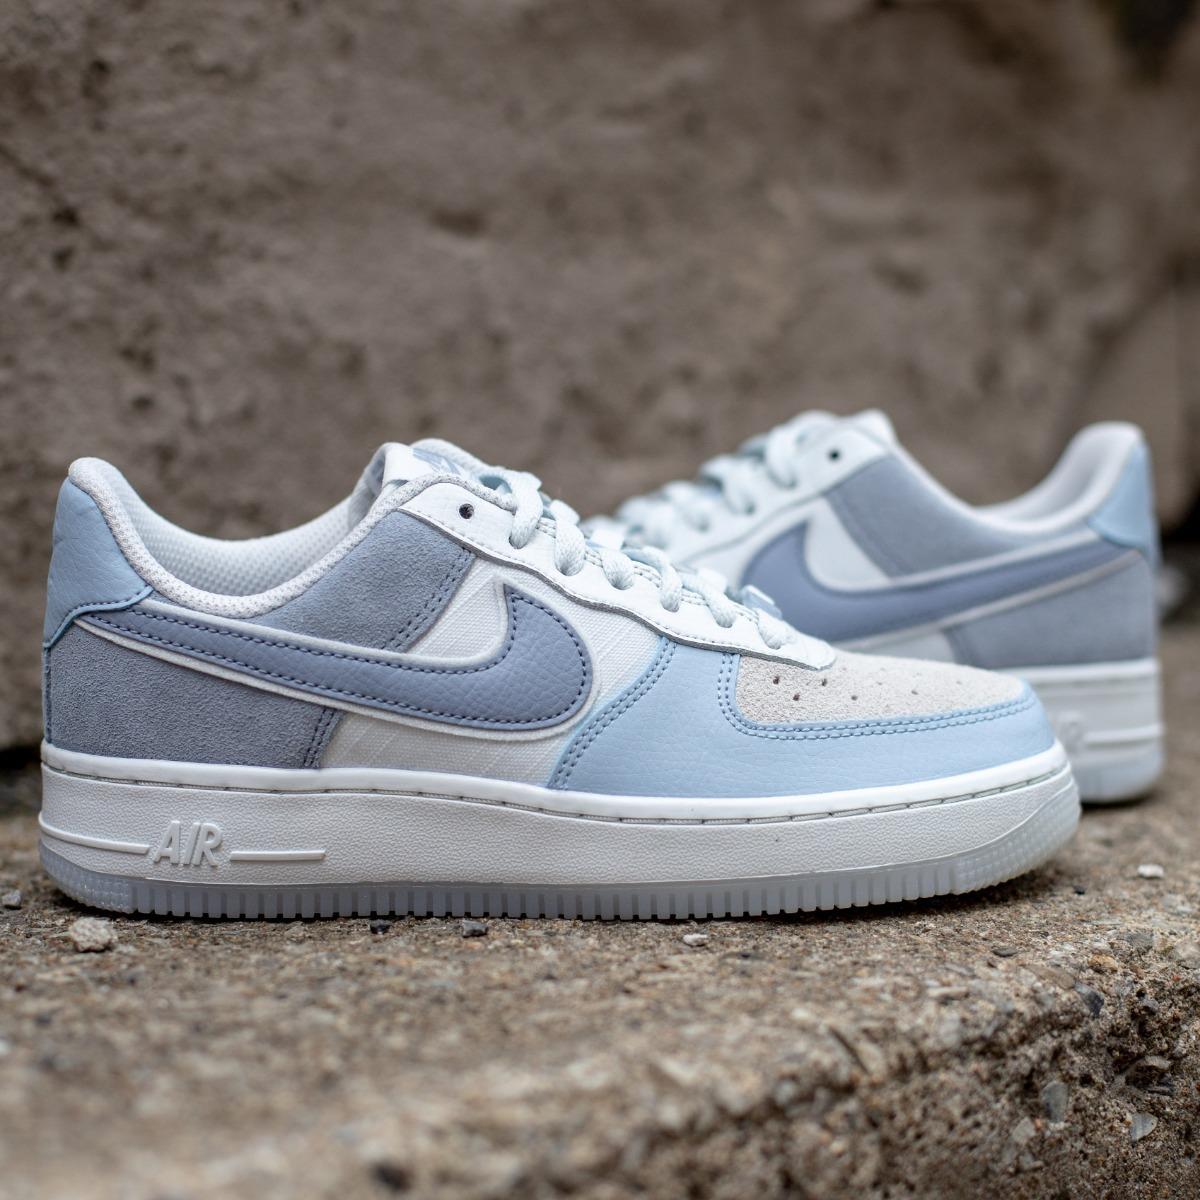 Zapatillas Nike Air Force 1 Low Premium Celeste Y Gris Dama